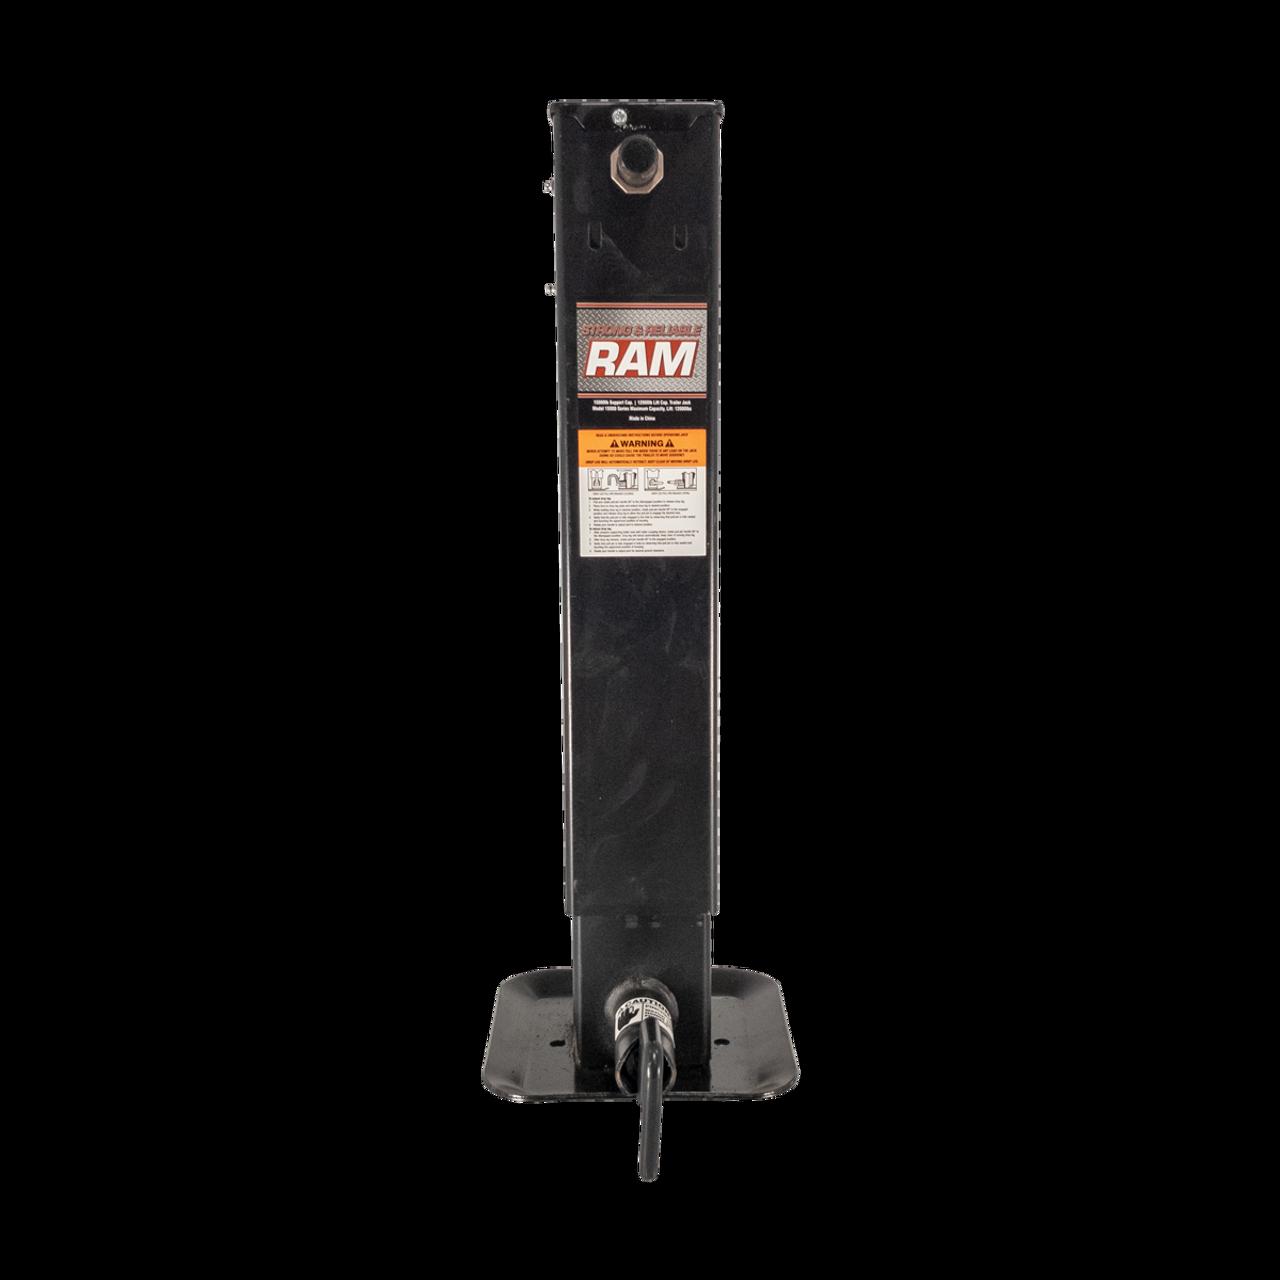 RAM15000SL --- RAM Drop Leg Sidewind Trailer Jack - 12,000 lb